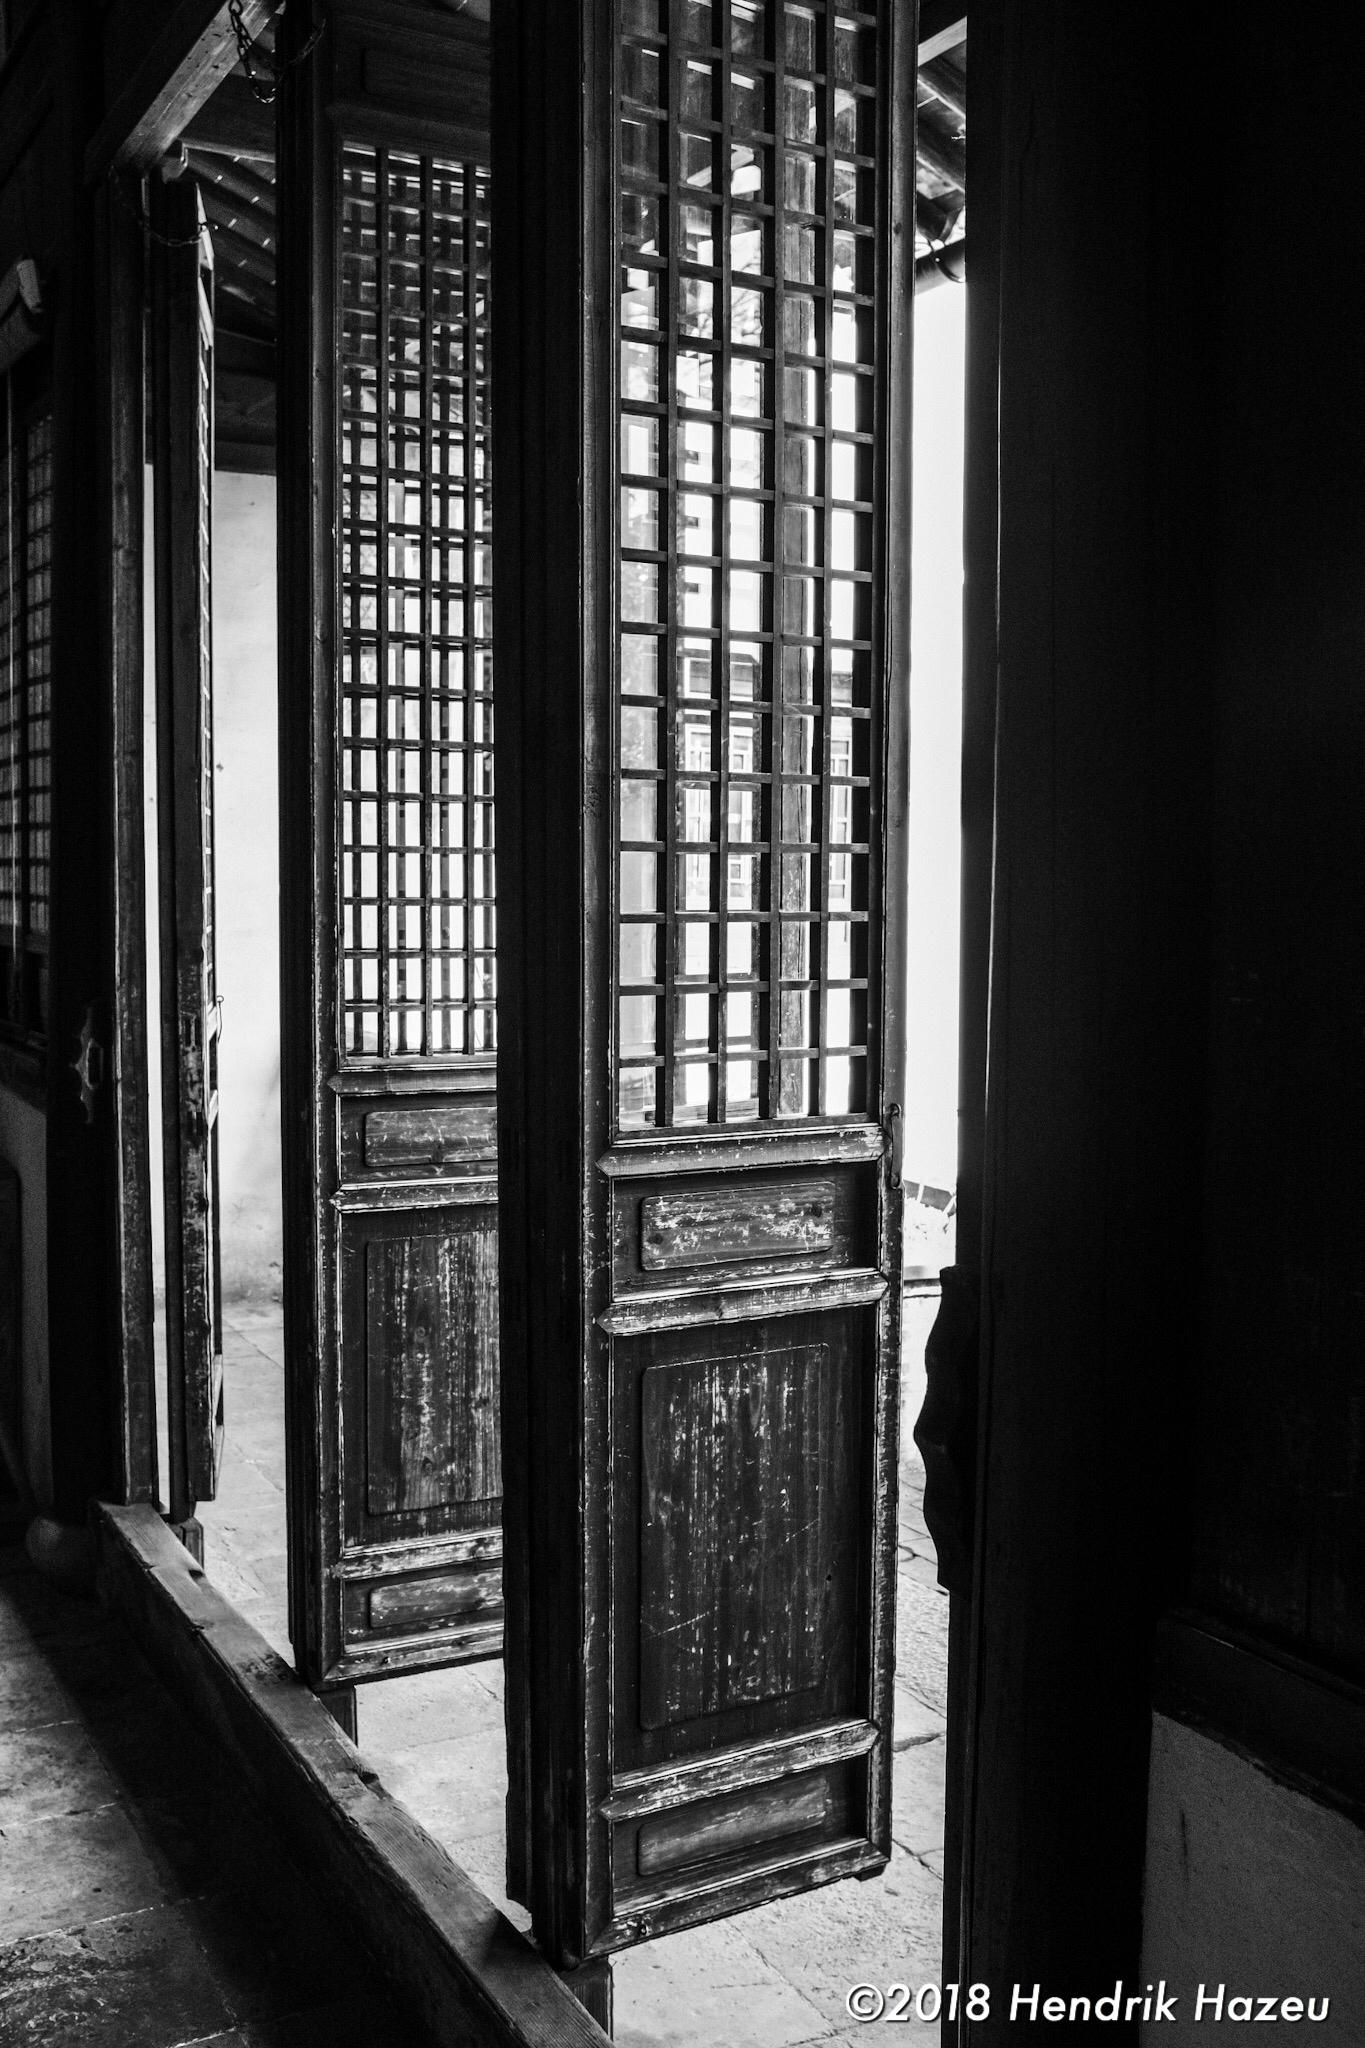 Courtyard doors,Fuji X100F, 23mm f/2 @f/5.6, 1/60sec ISO400 developed in LR CC mobile